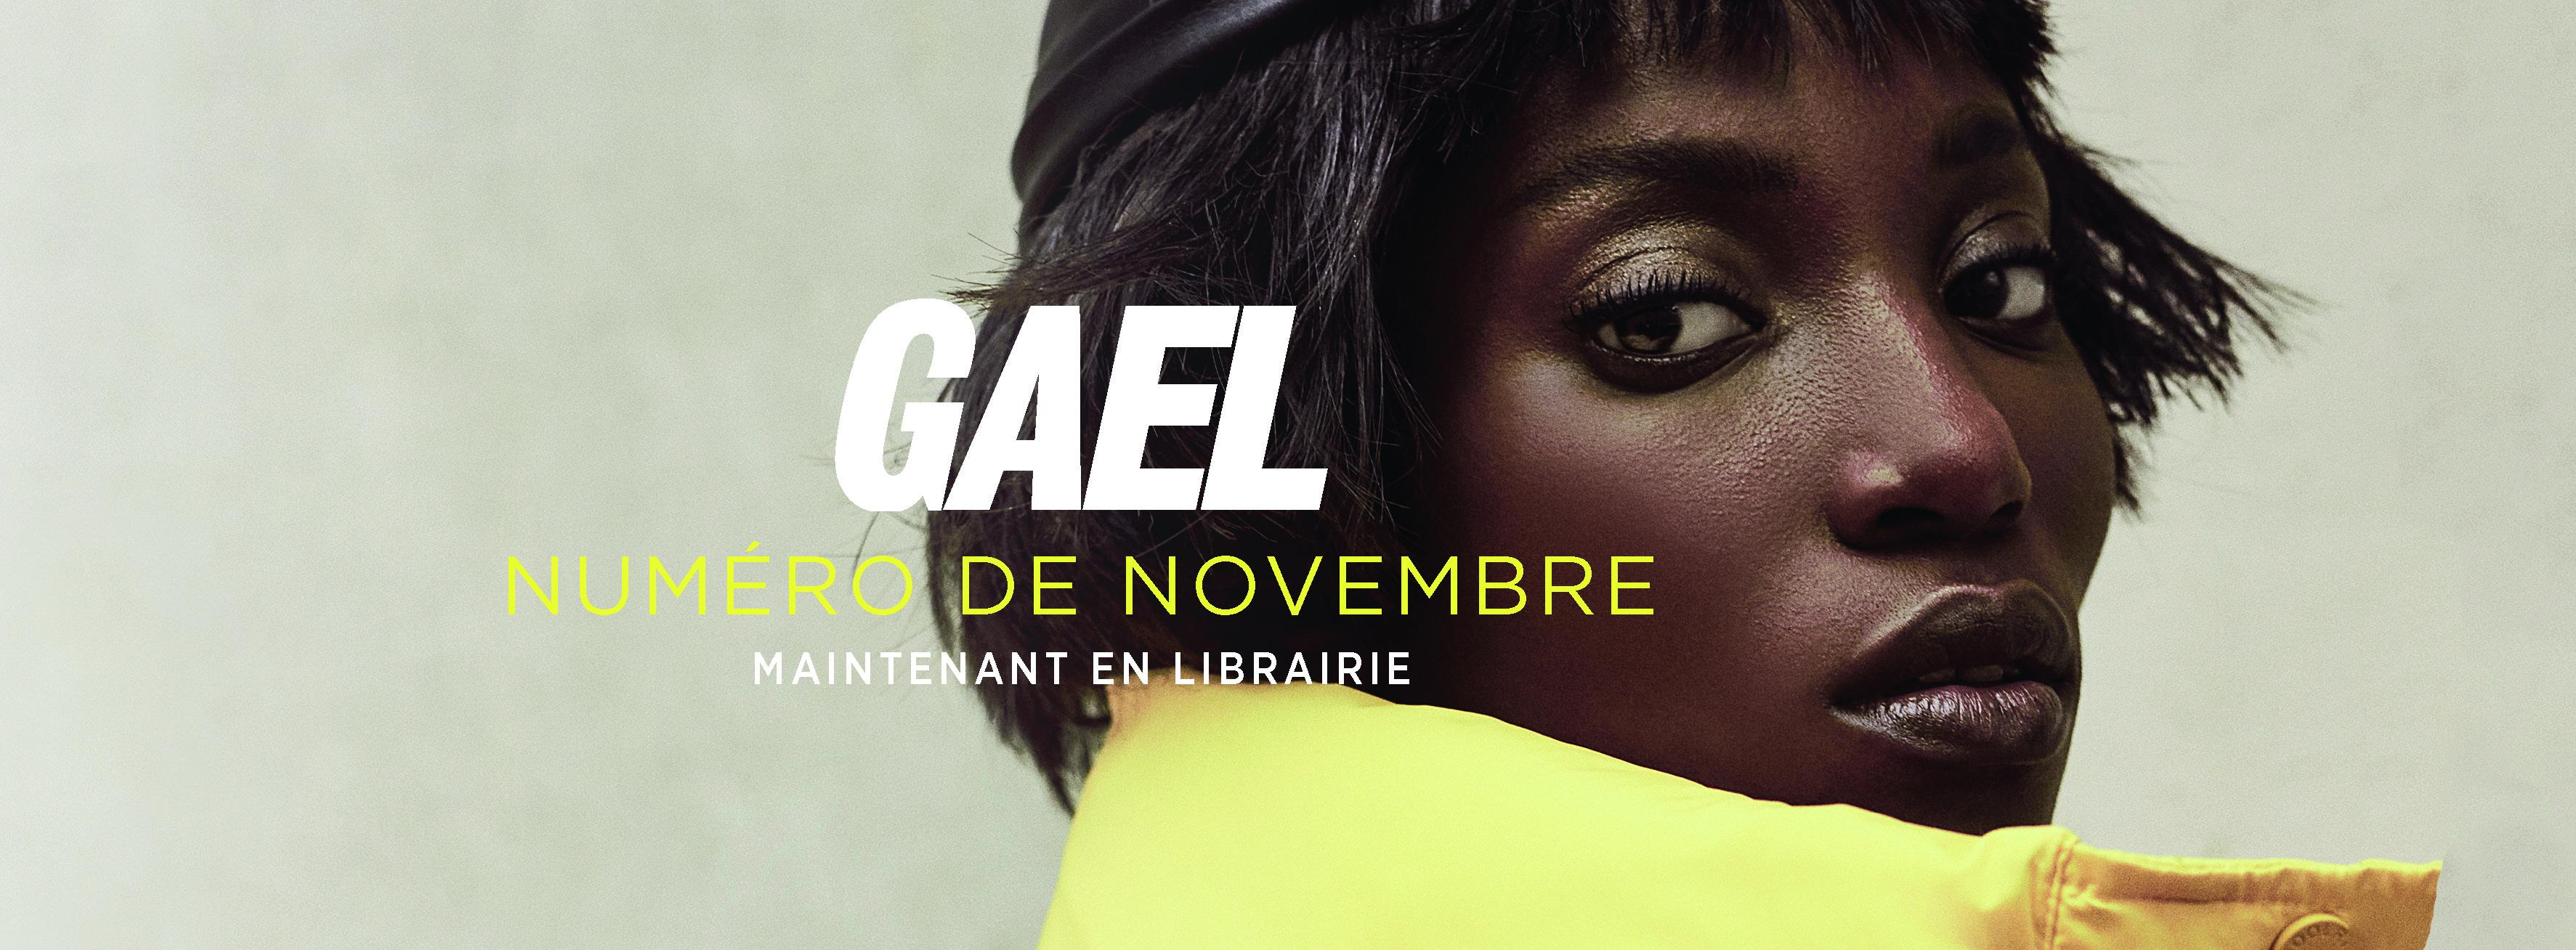 Le GAEL de novembre est disponible en librairie!